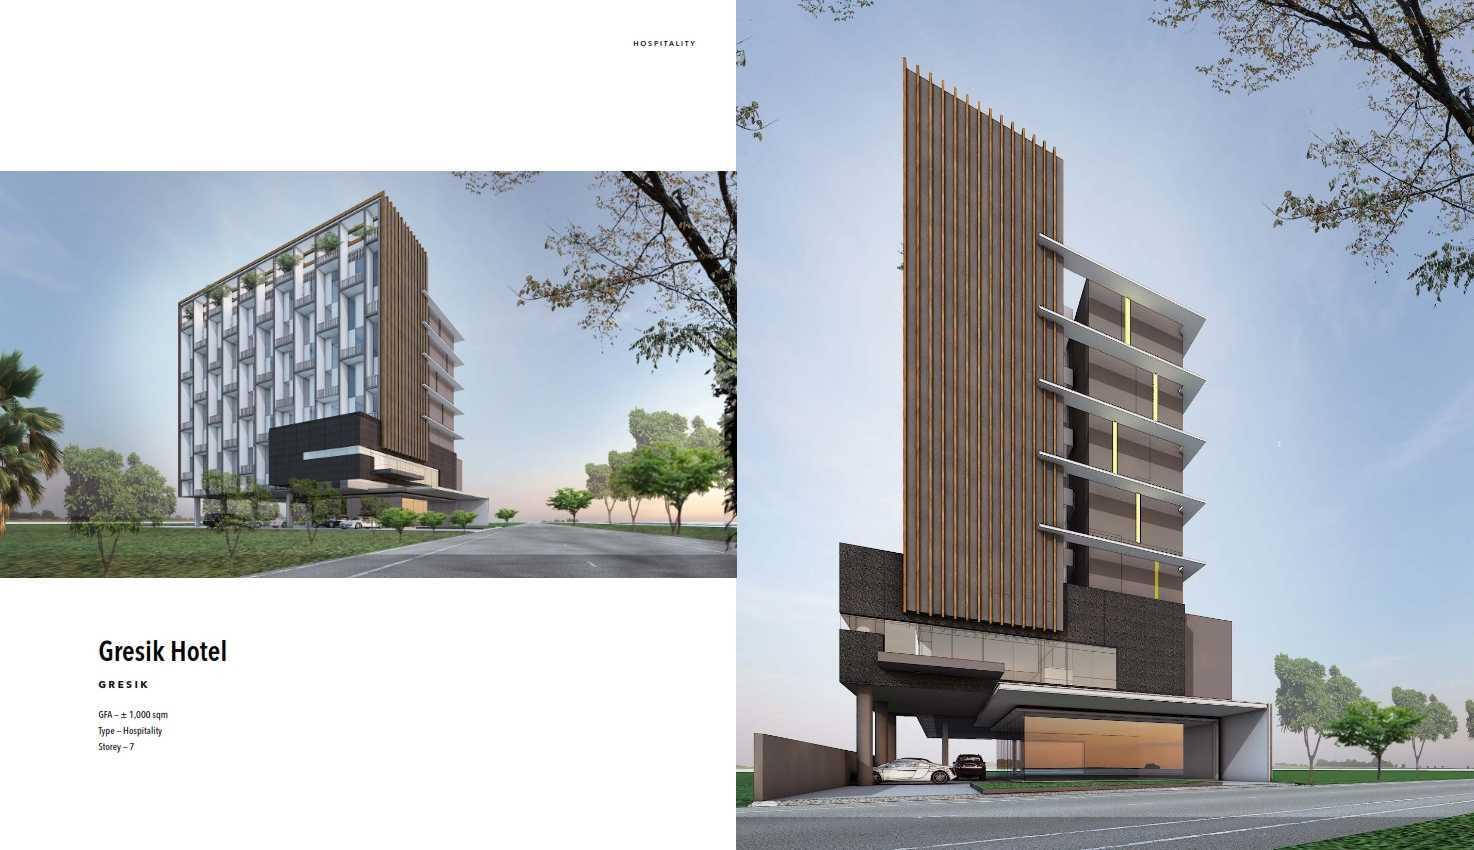 Alien Design Consultant Alien Dc Hotels & Resort Porto Palembang Palembang Aliencompro260Mmx300Mm12Updated053   44721